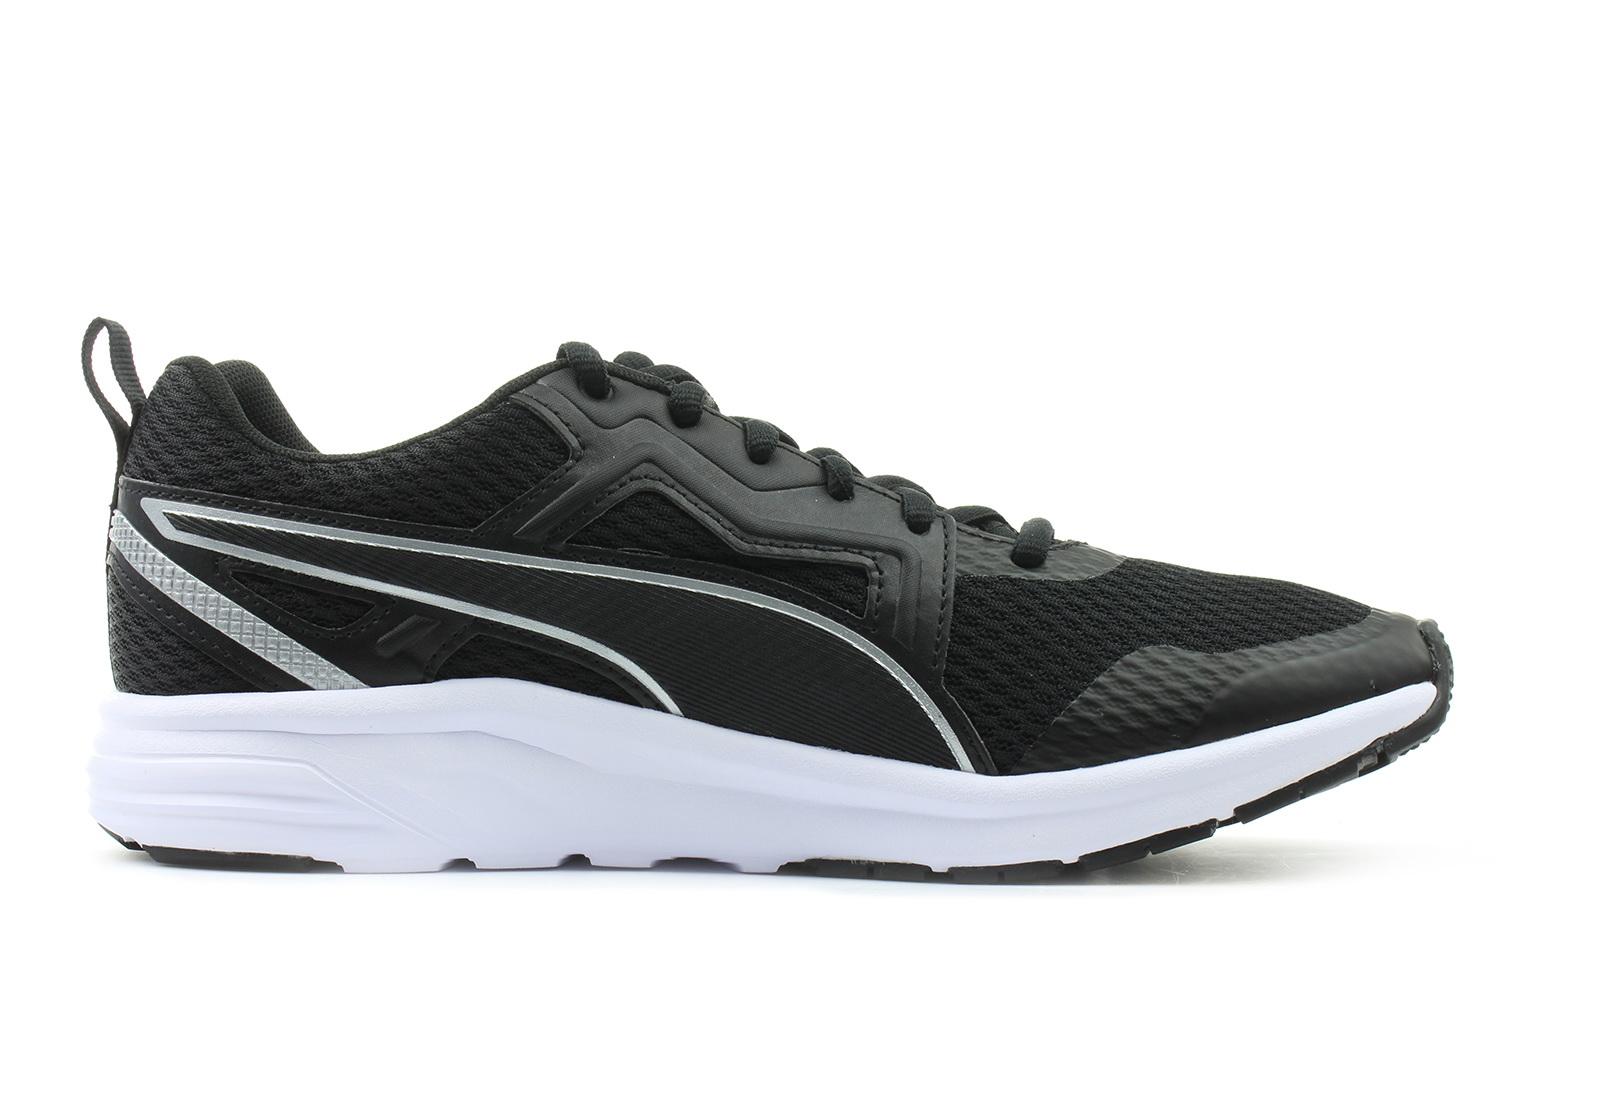 Puma Cipő Tsugi Shinsei Ut 36548901 blk Office Shoes